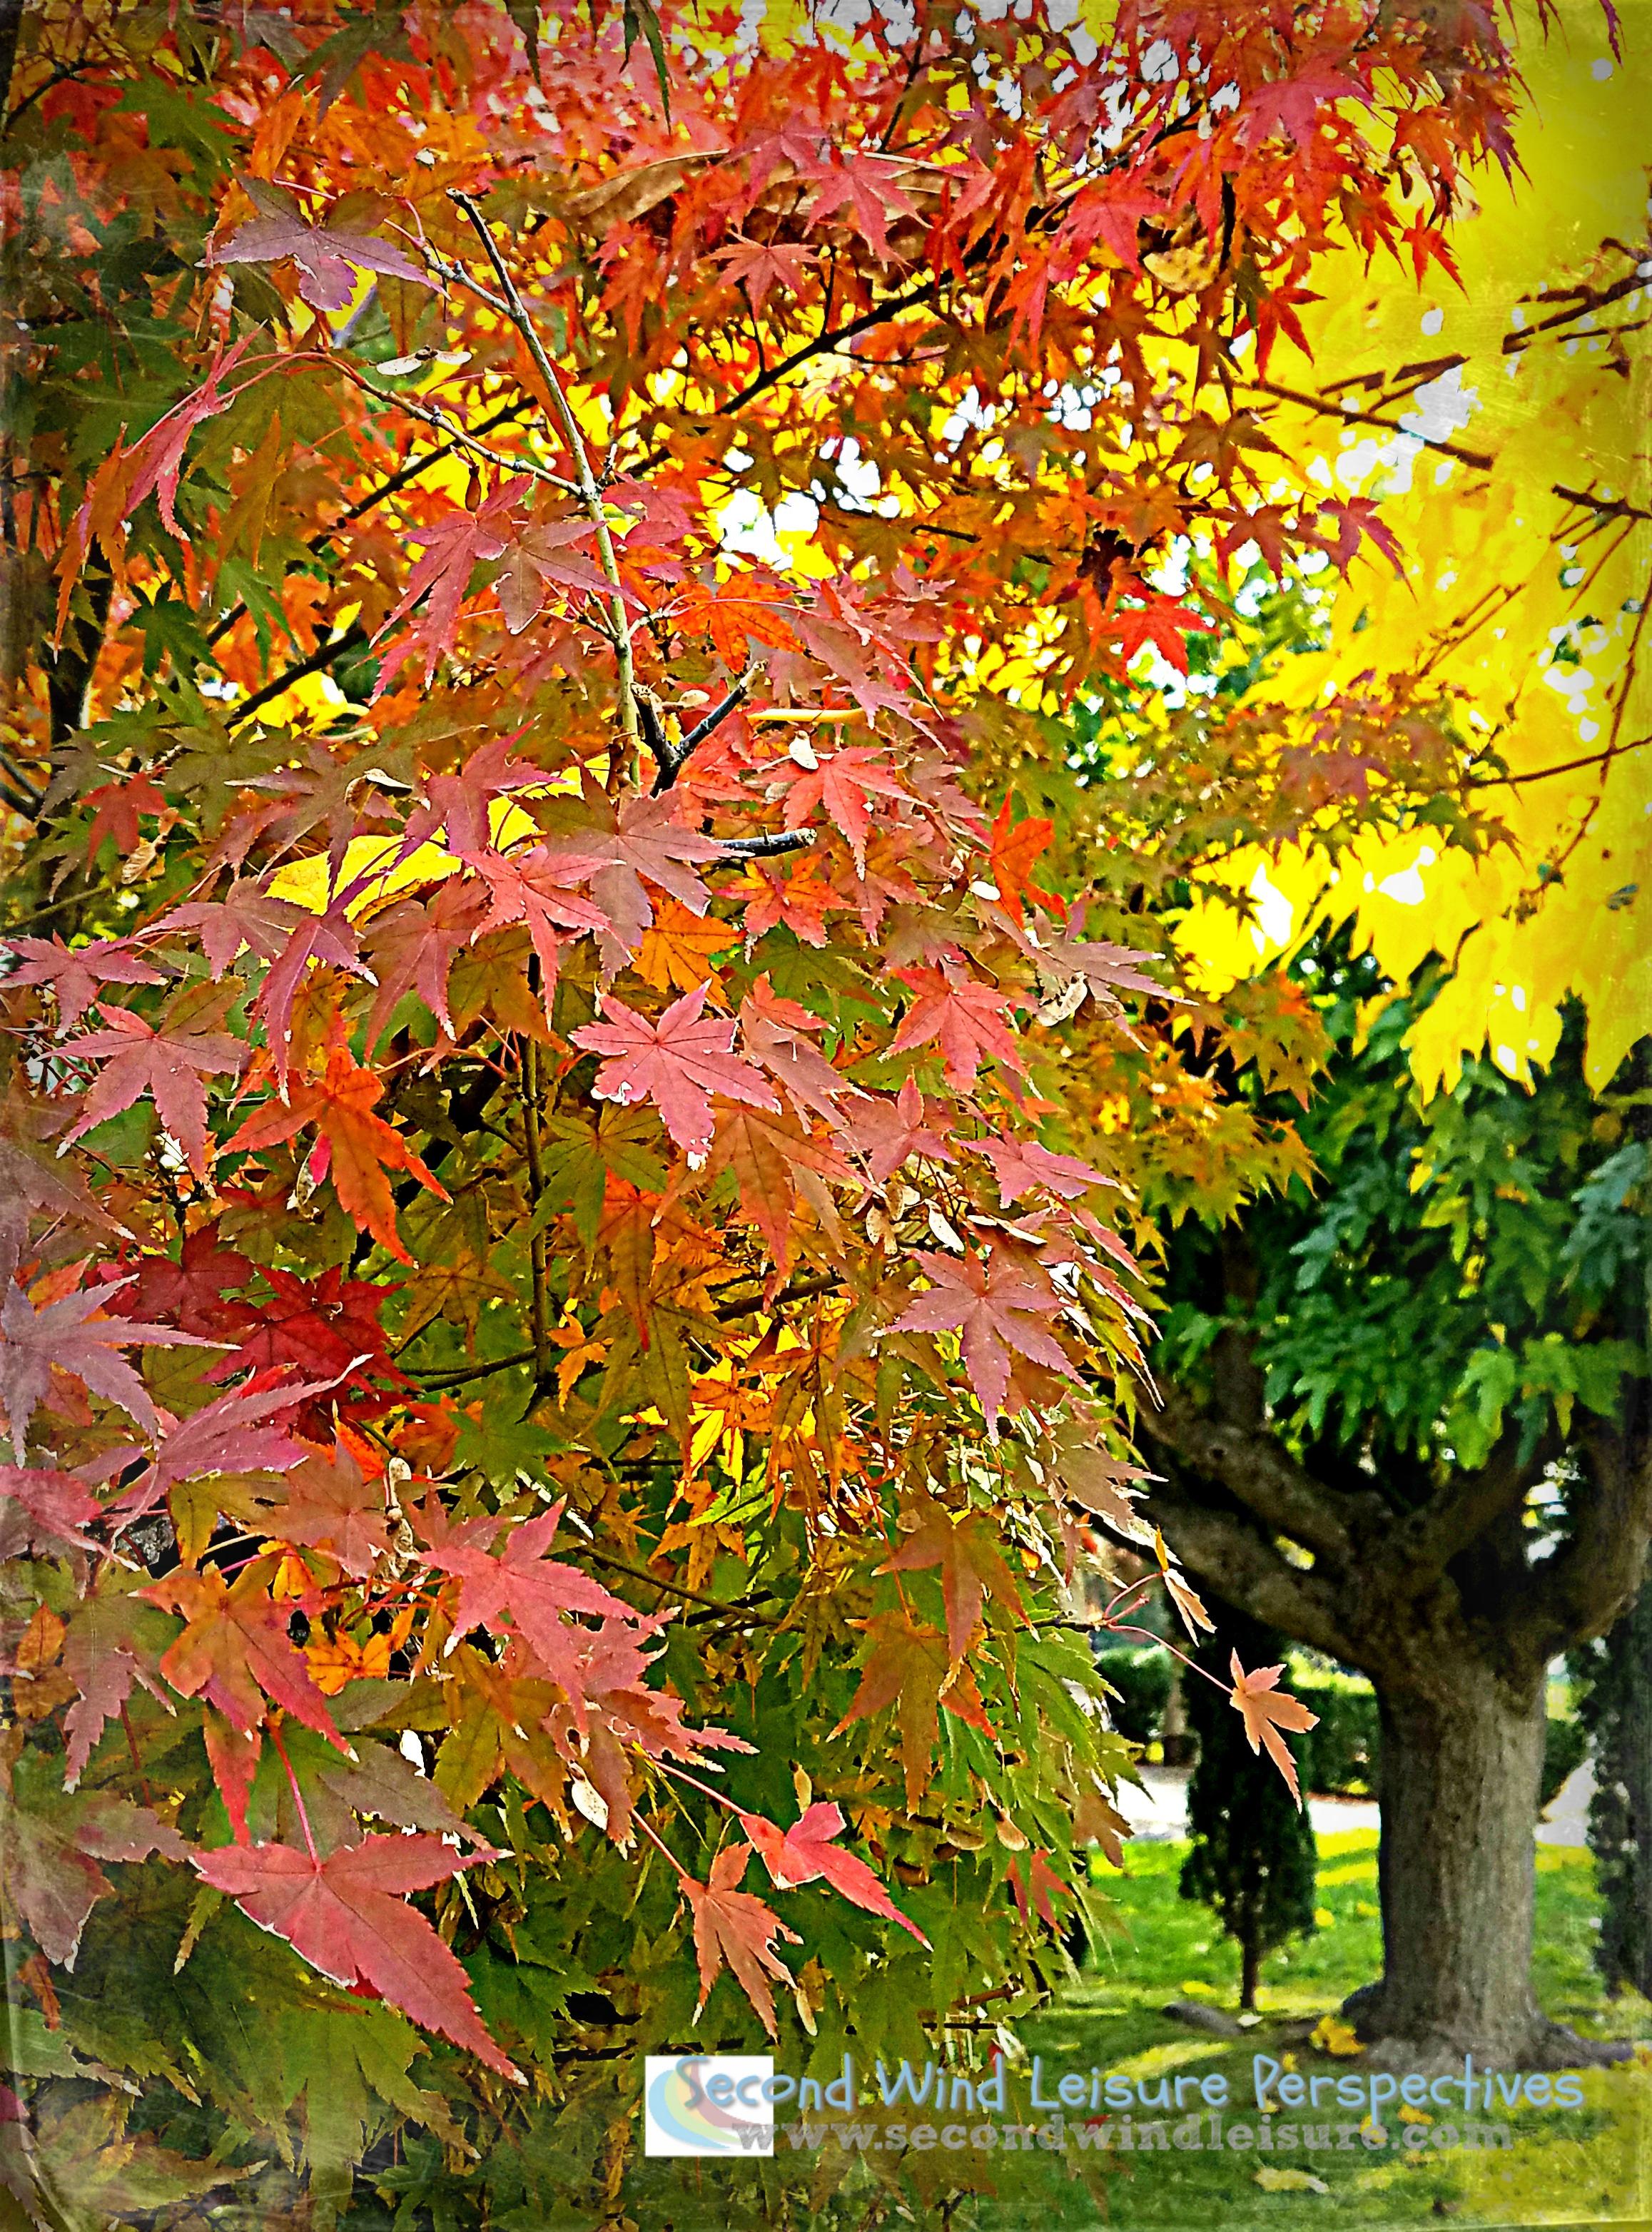 Autumn in Transition